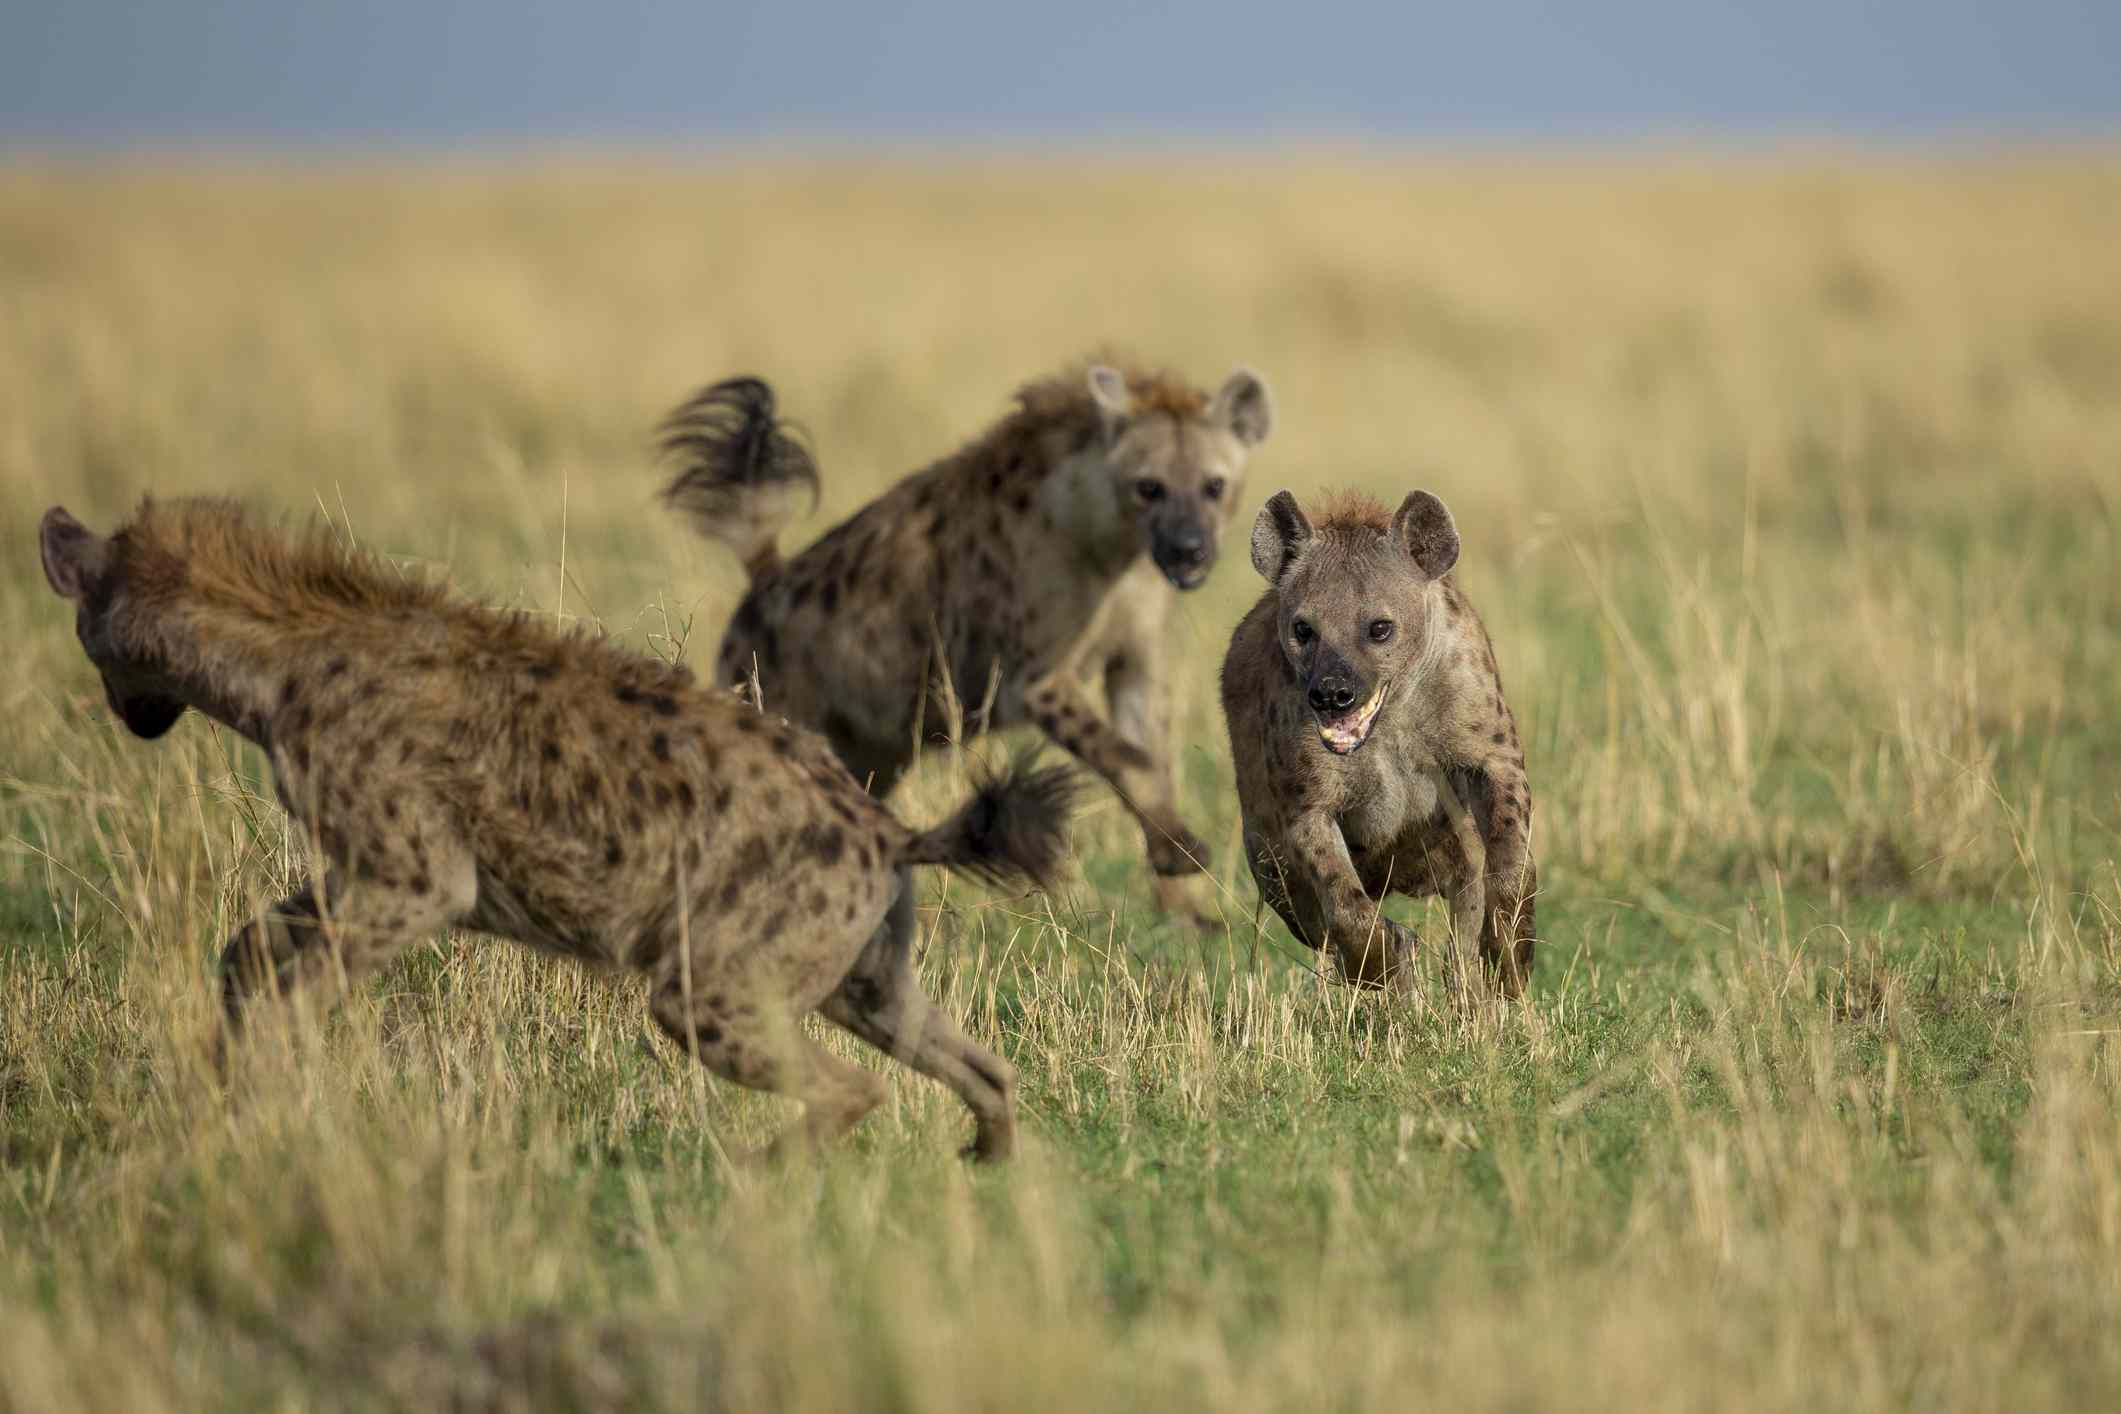 Pack of hyenas running in tall grass